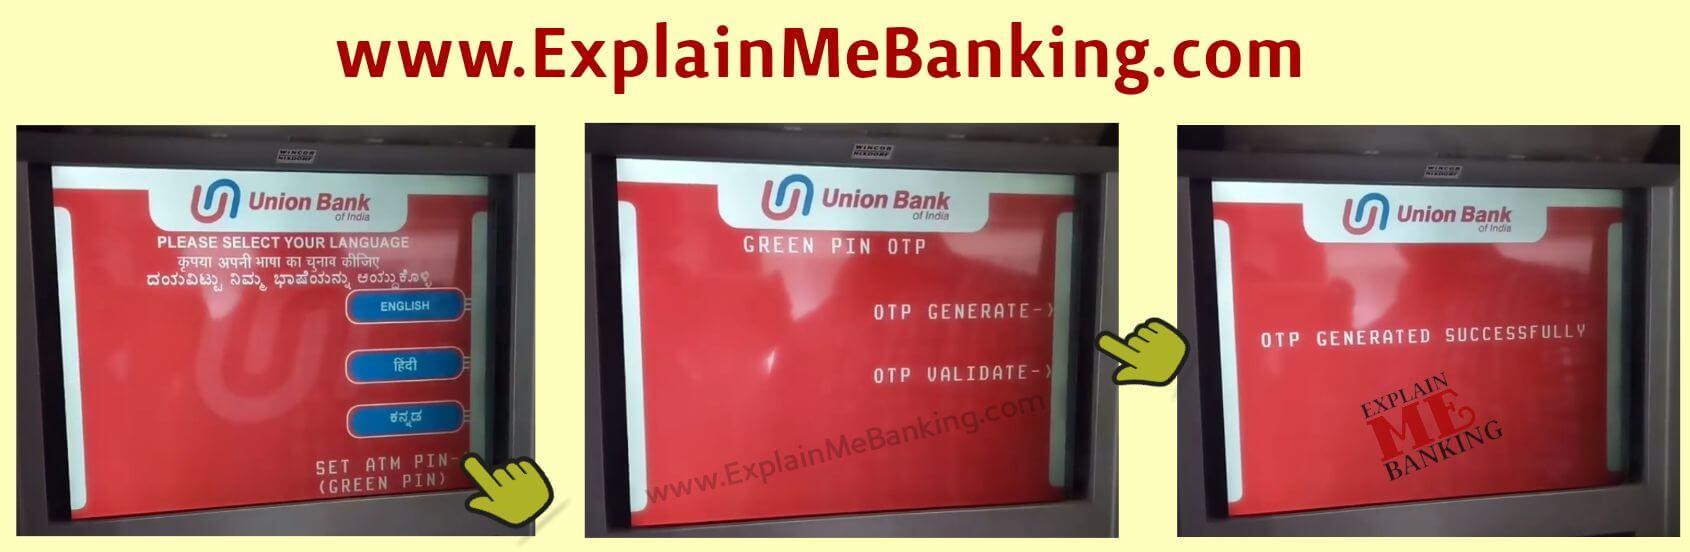 UBI ATM PIN Generation